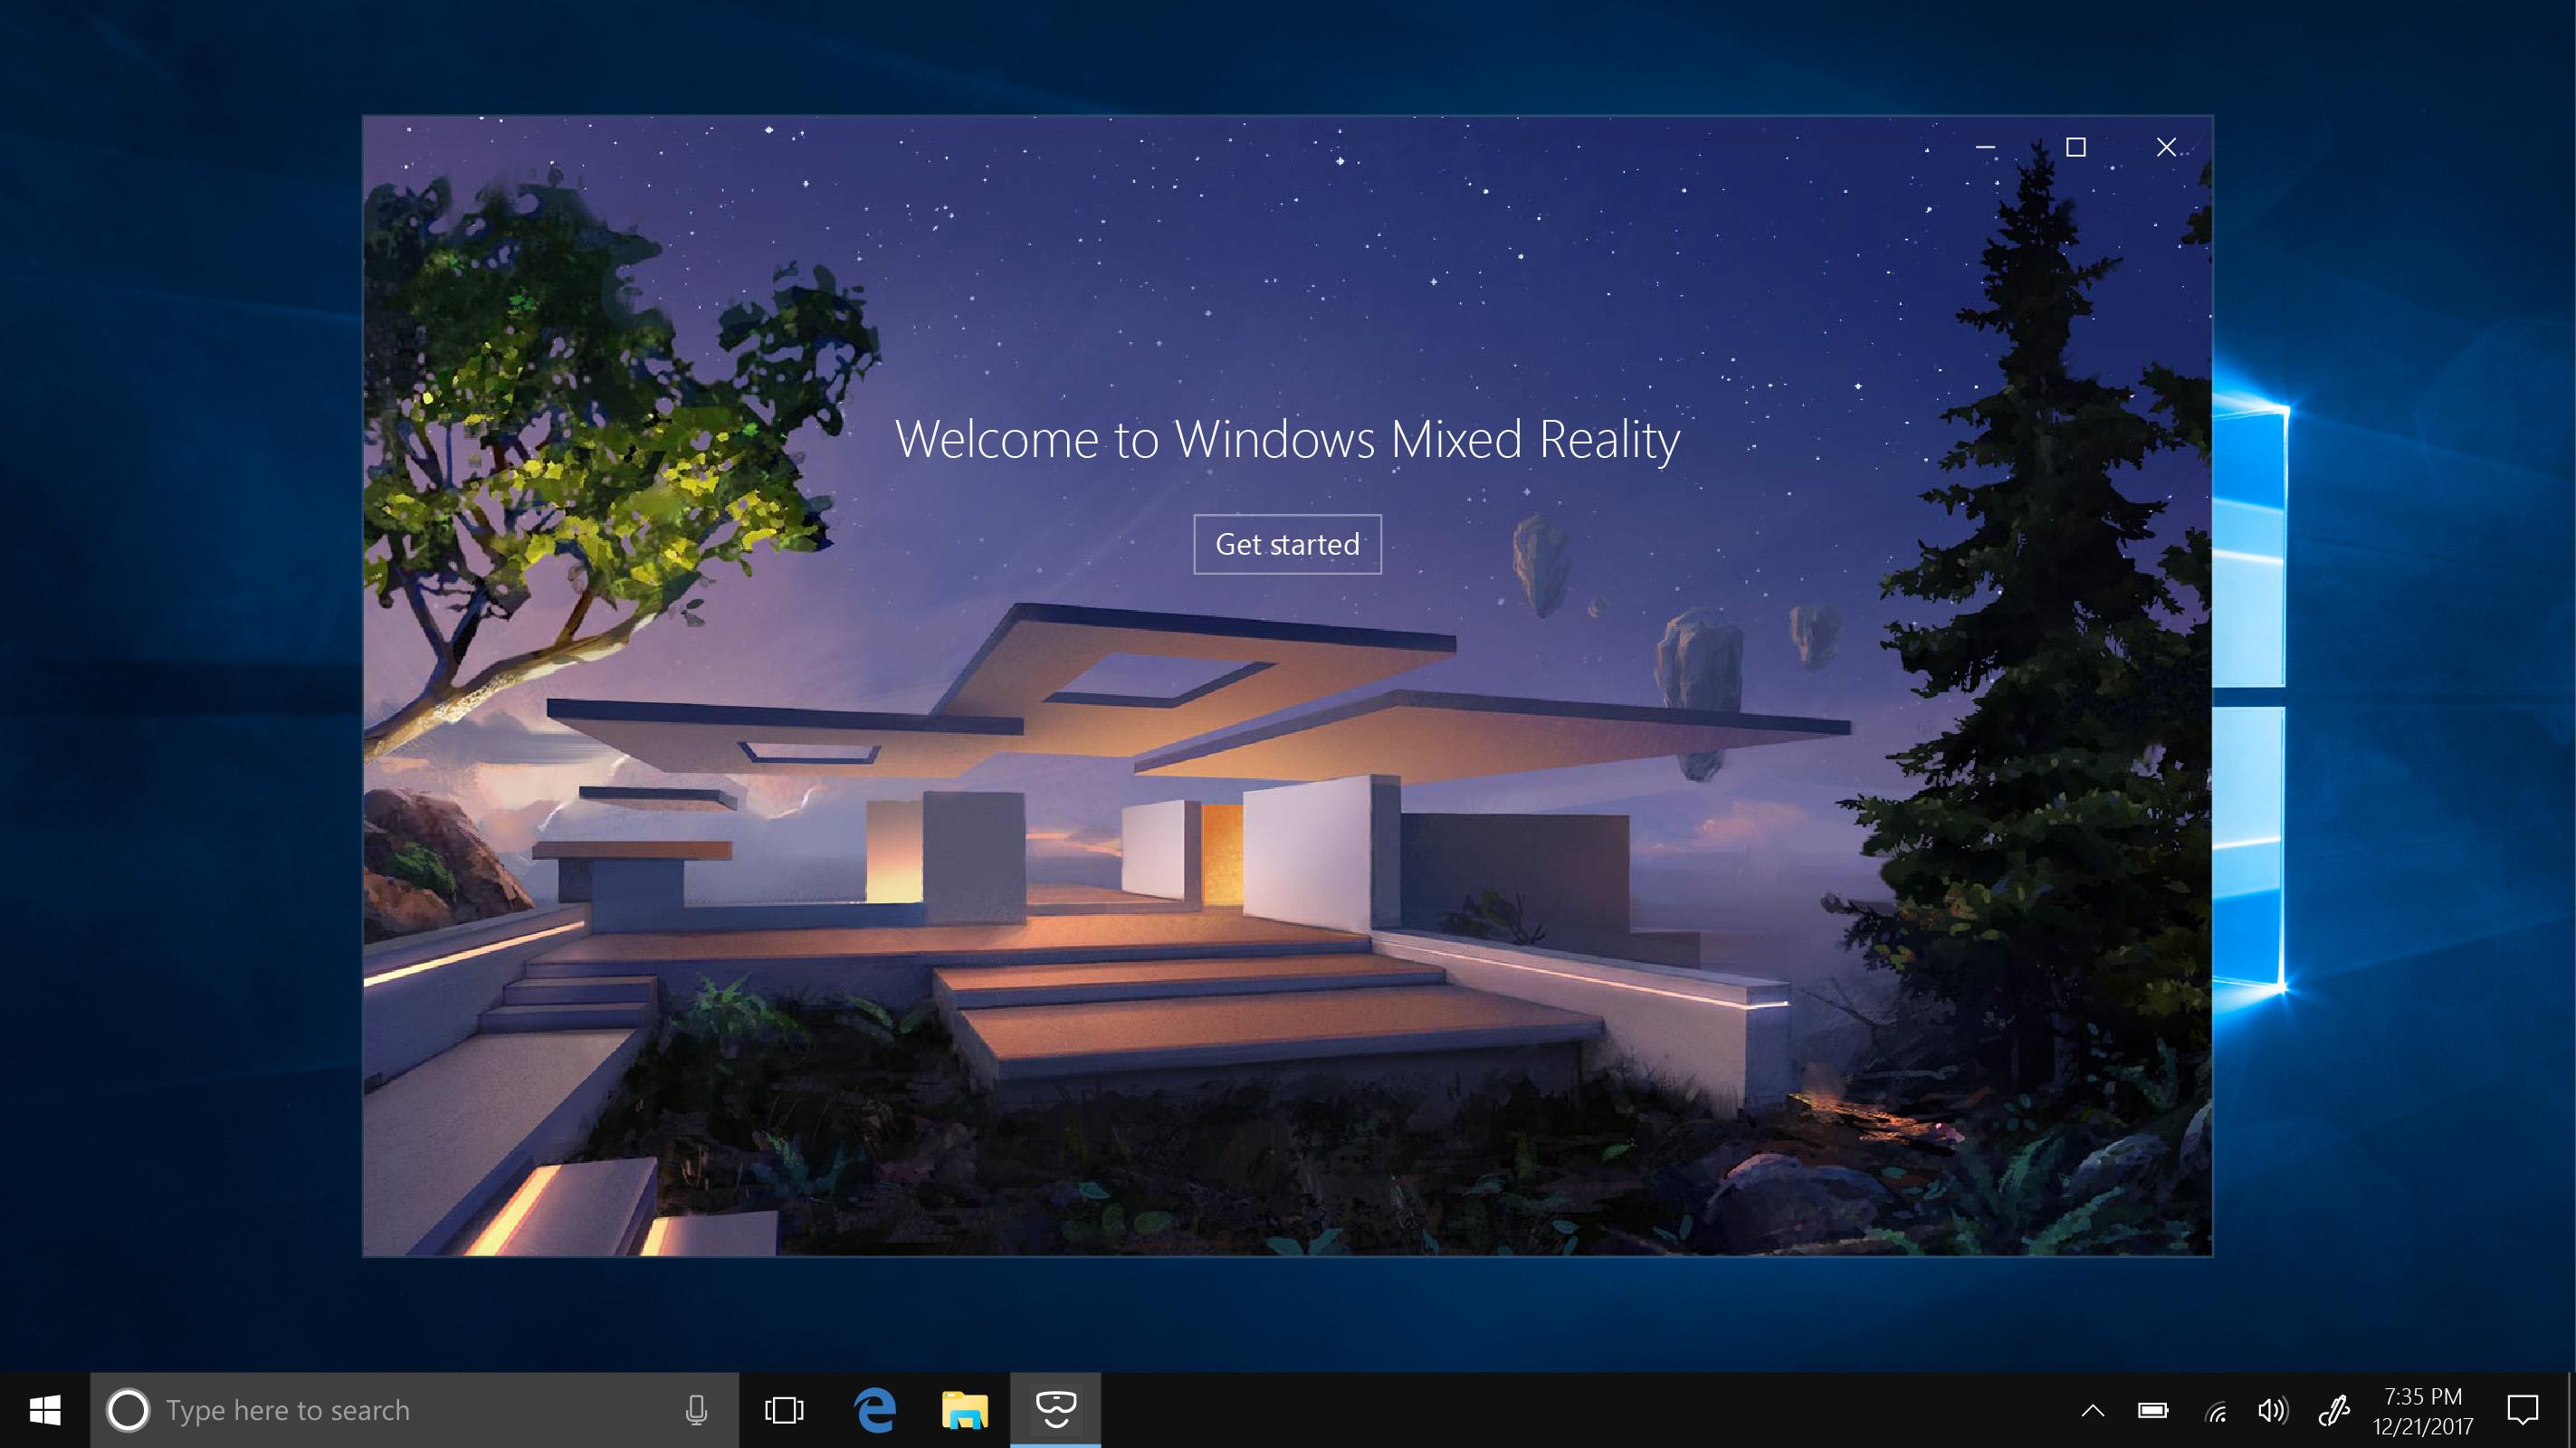 Windows 10 Fall Creators Update Released